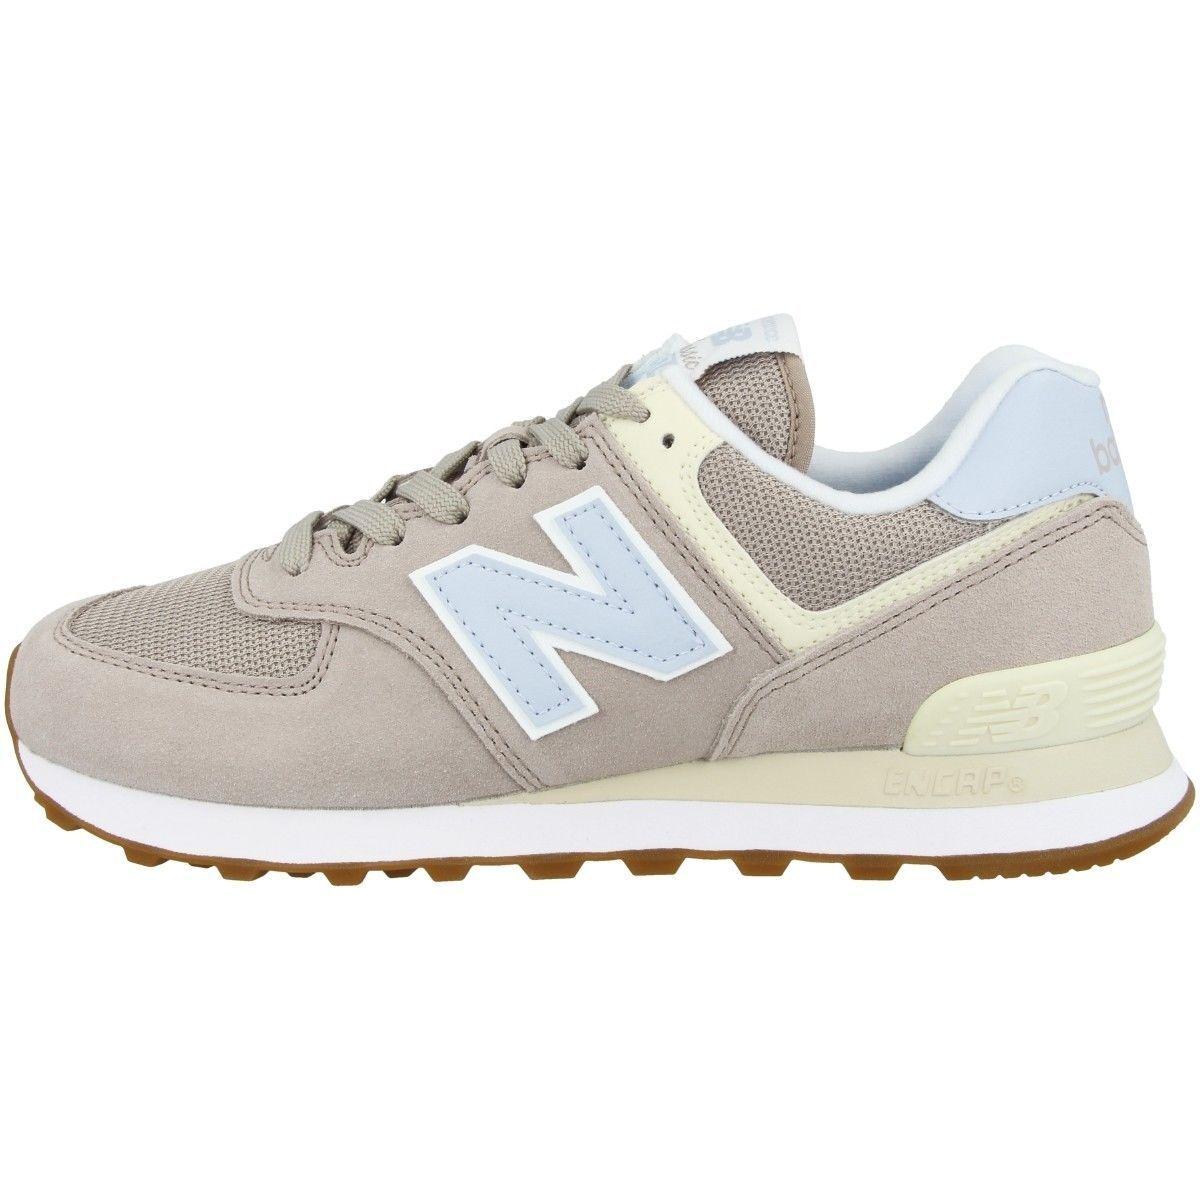 NEW BALANCE WL 574 FCL scarpe palestra palestra palestra passeggio ginnastica donna e8358f